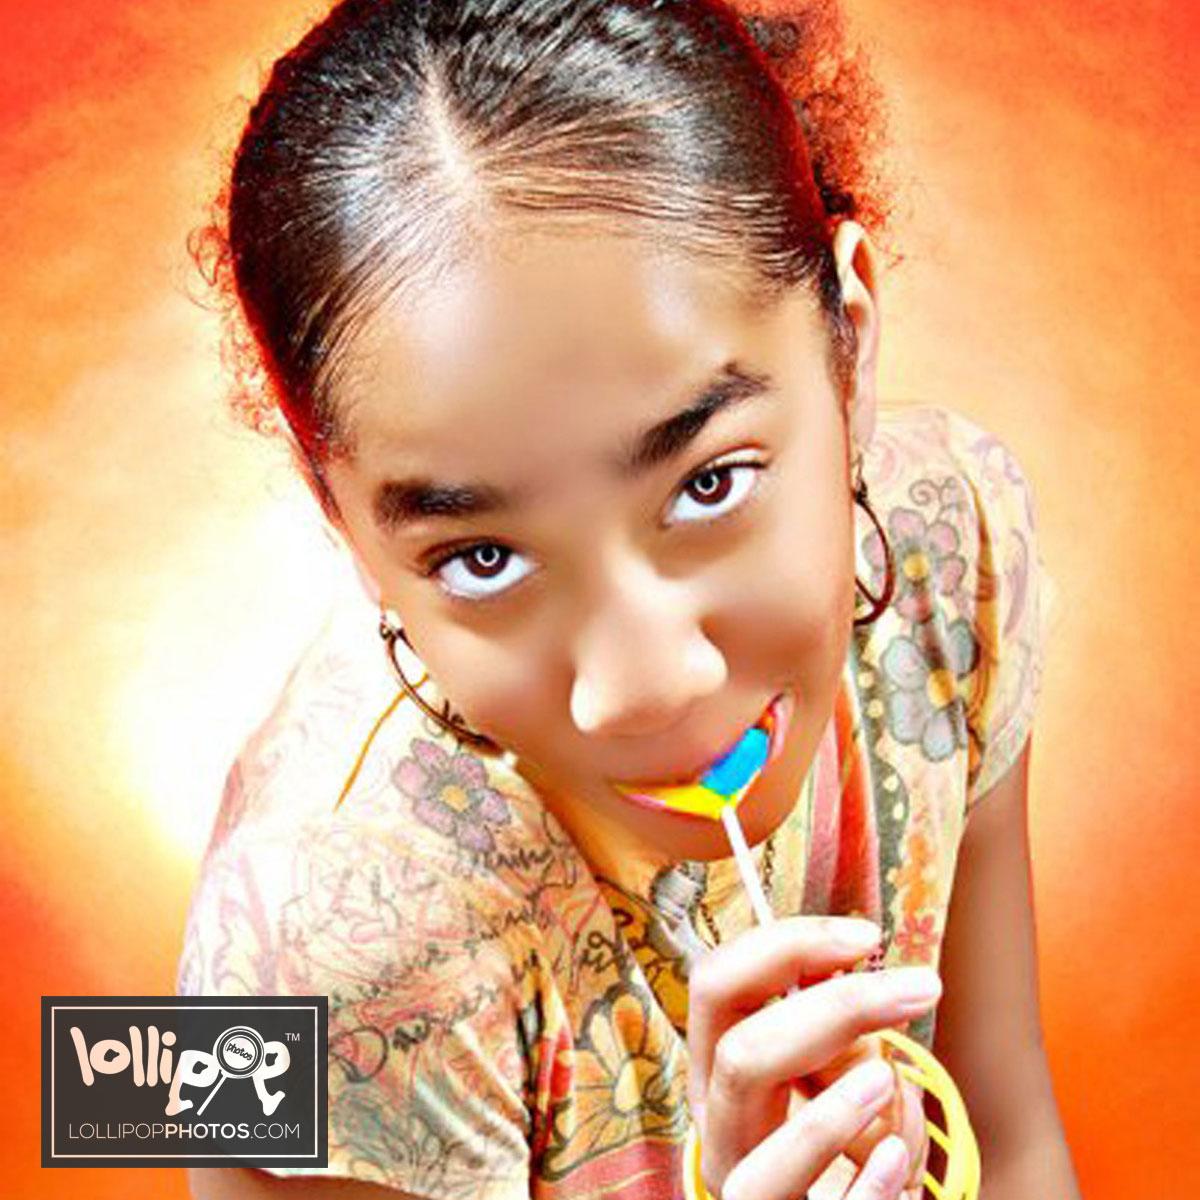 msdig-nora-canfield-lollipop-photos-005.jpg